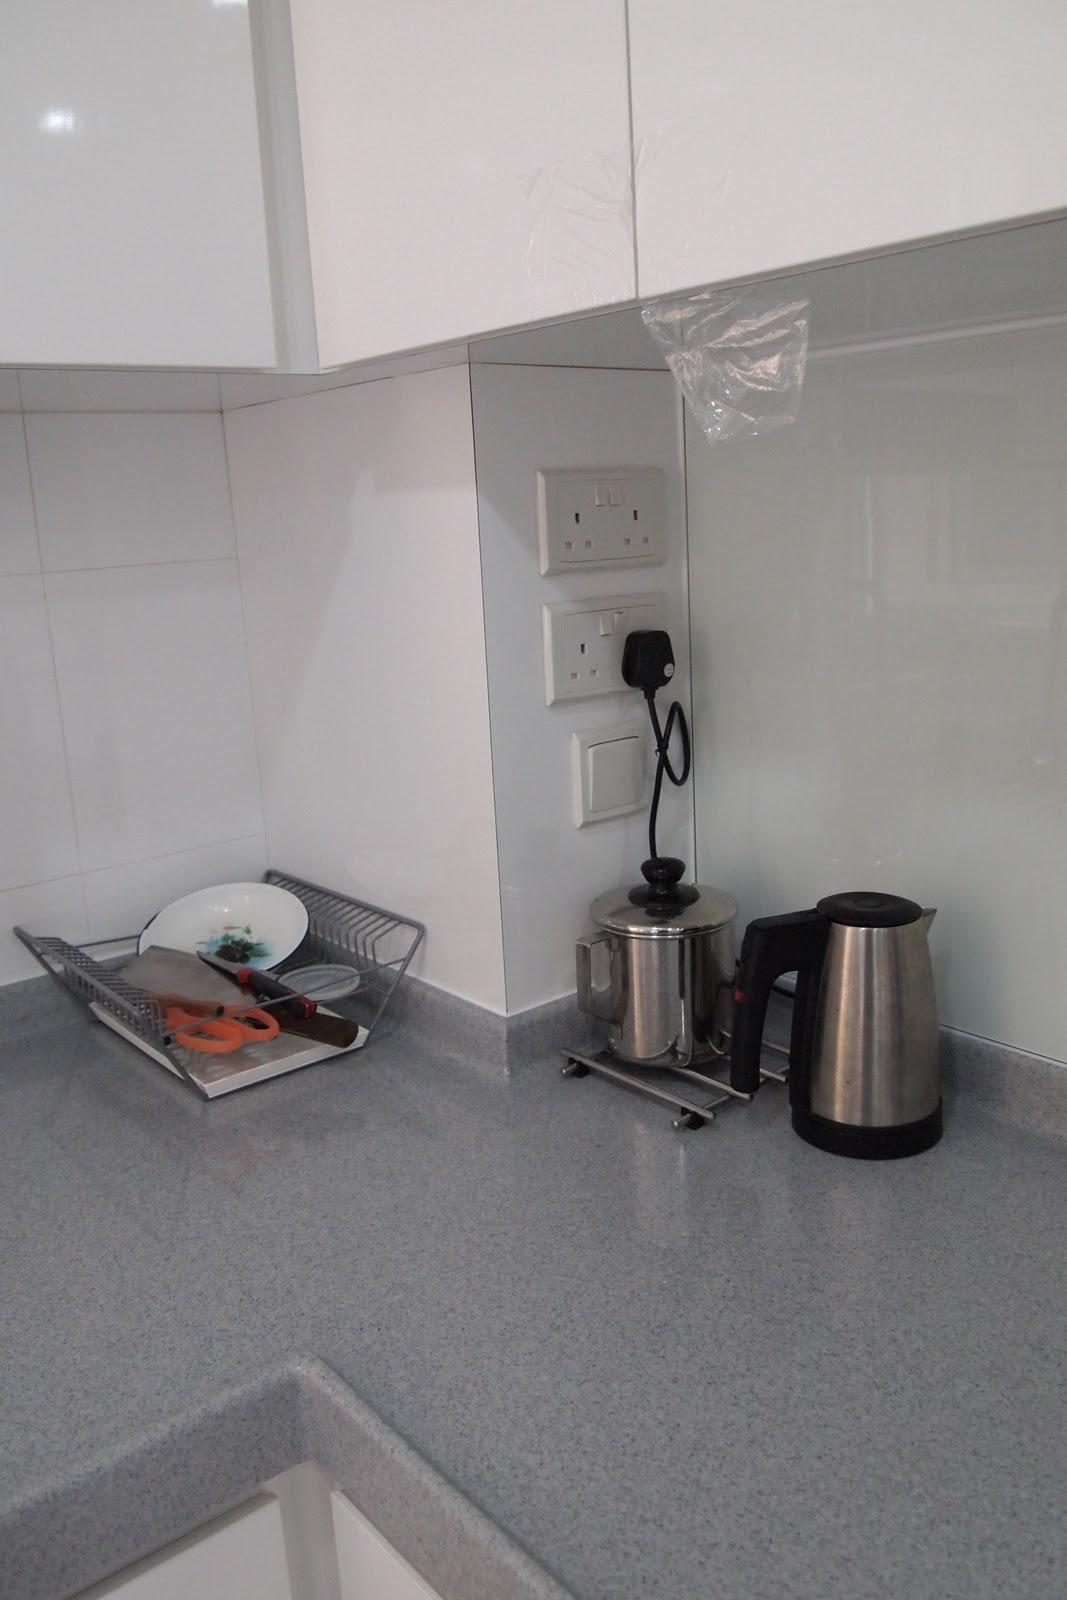 Refurbished Old Kitchen Cabinets